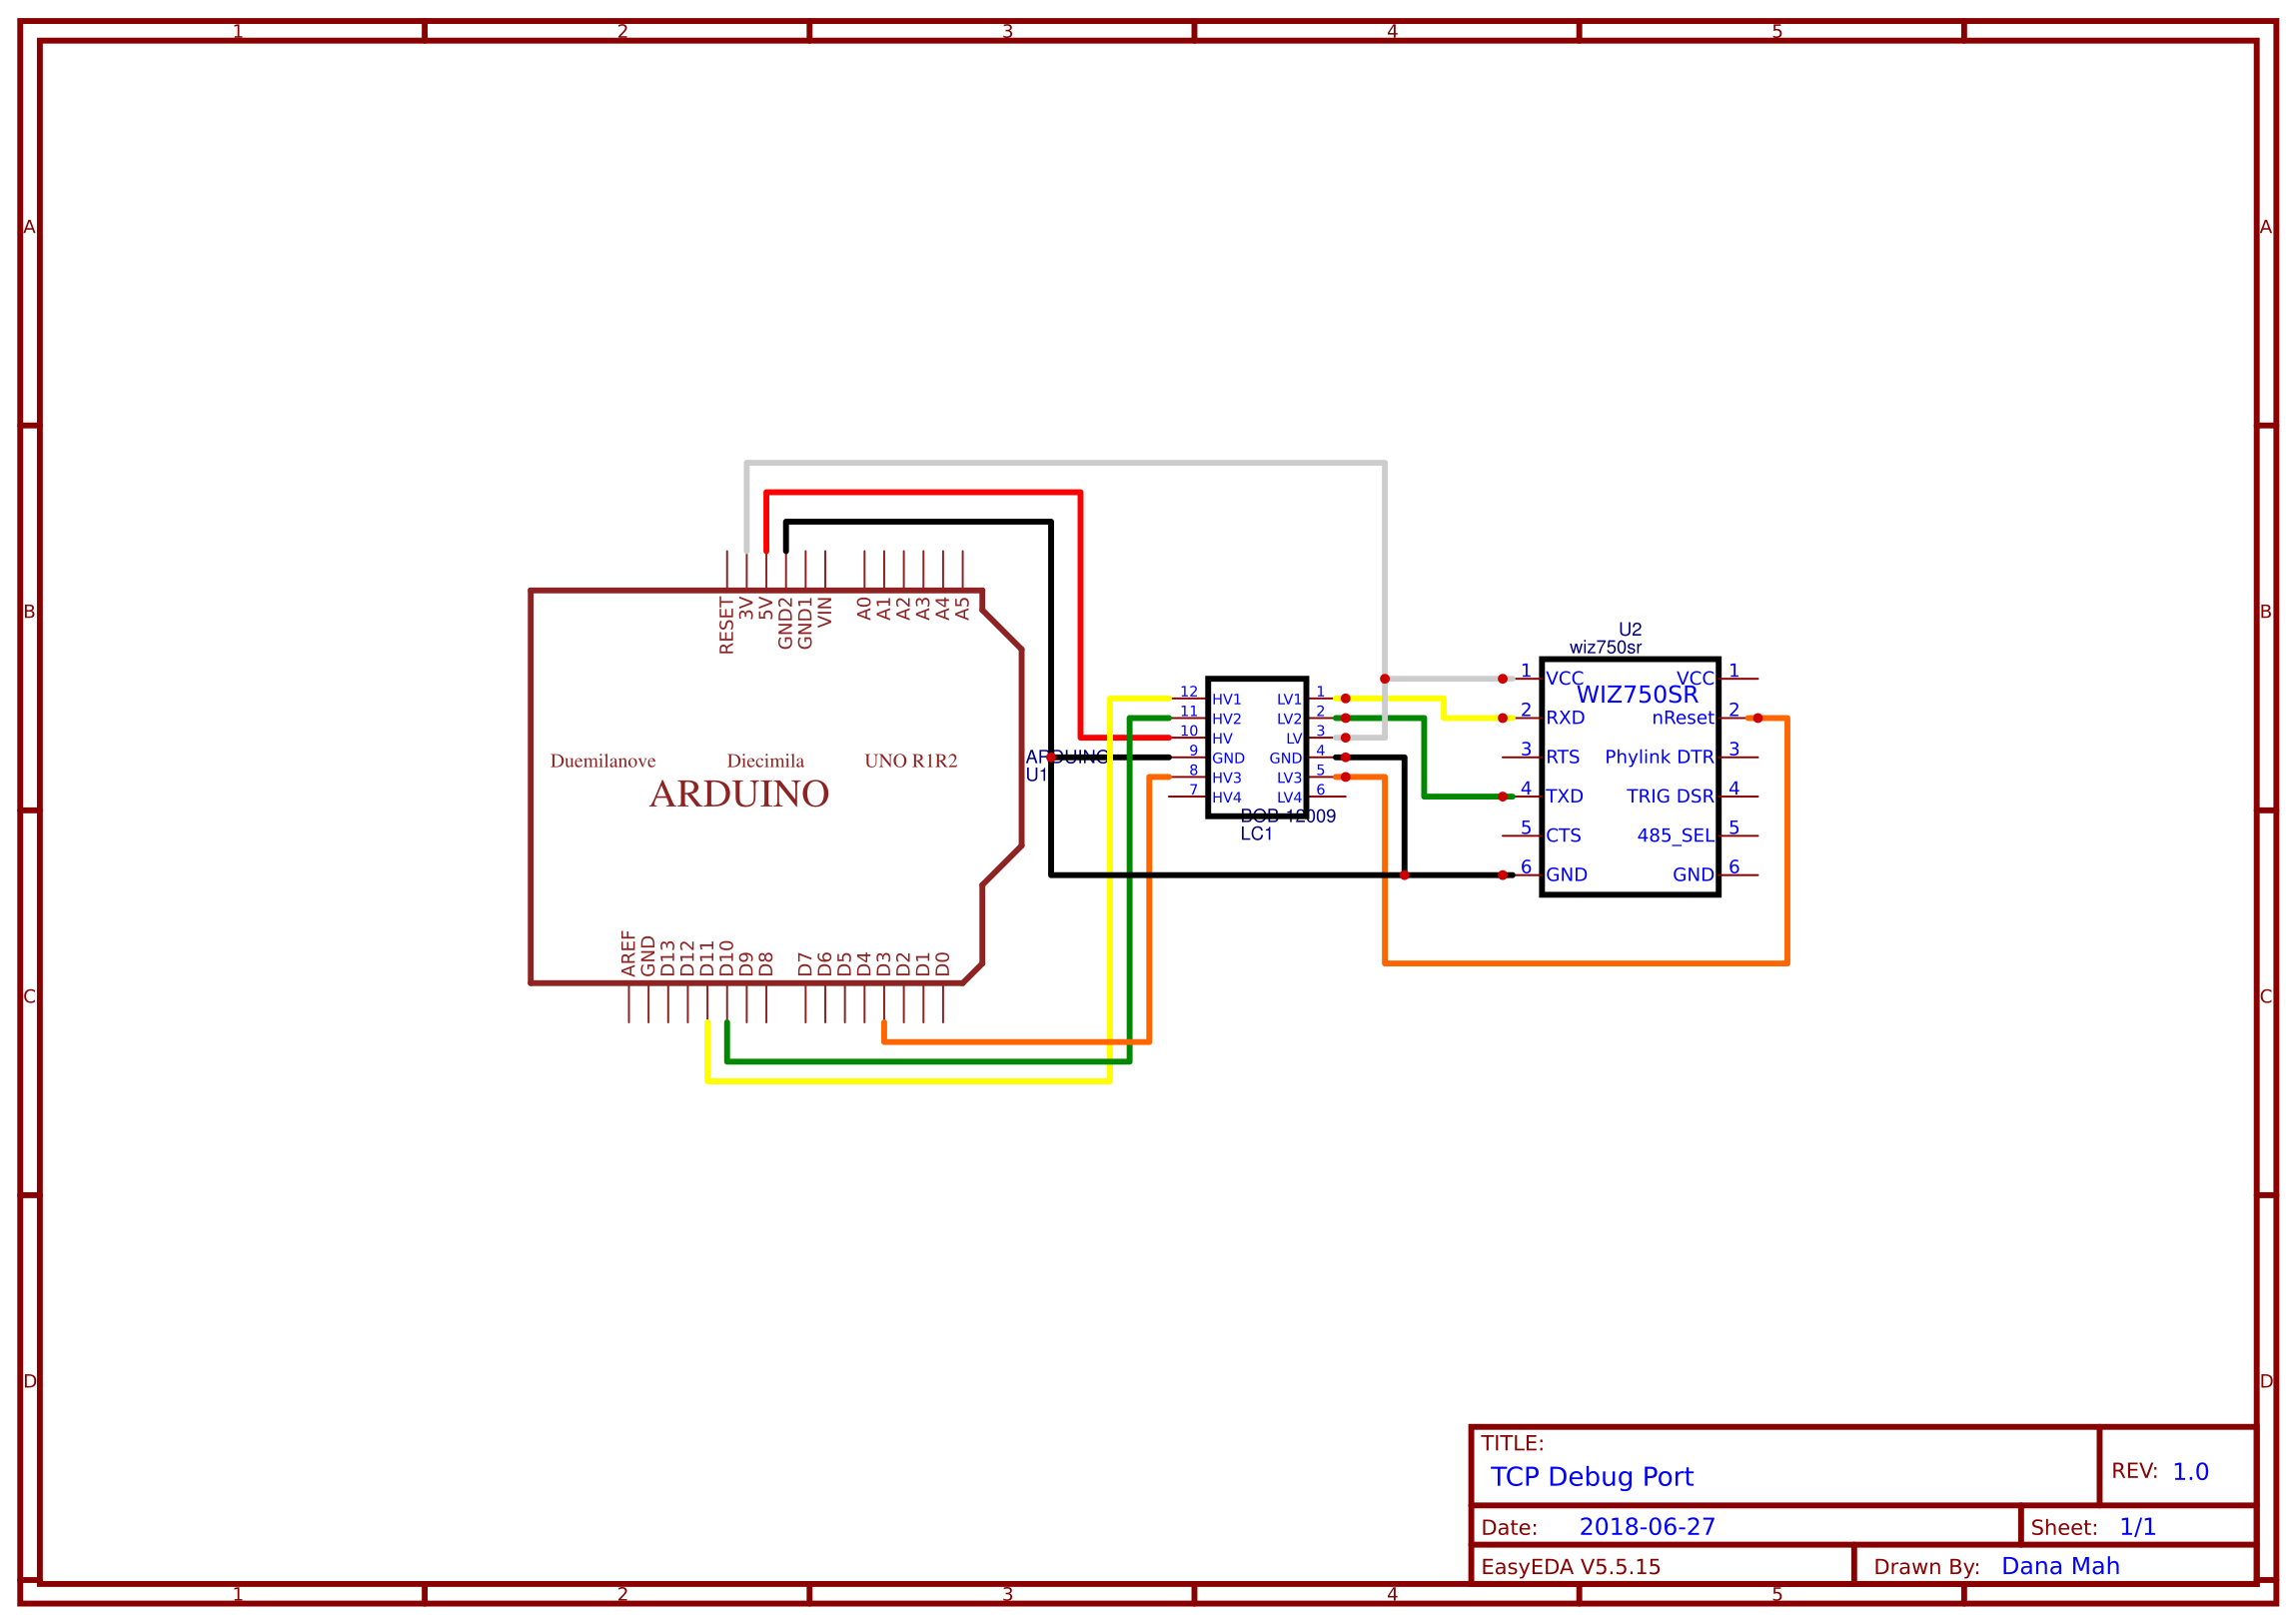 Schematic tcp debug port sheet 1 20180627151540 veyefia60k